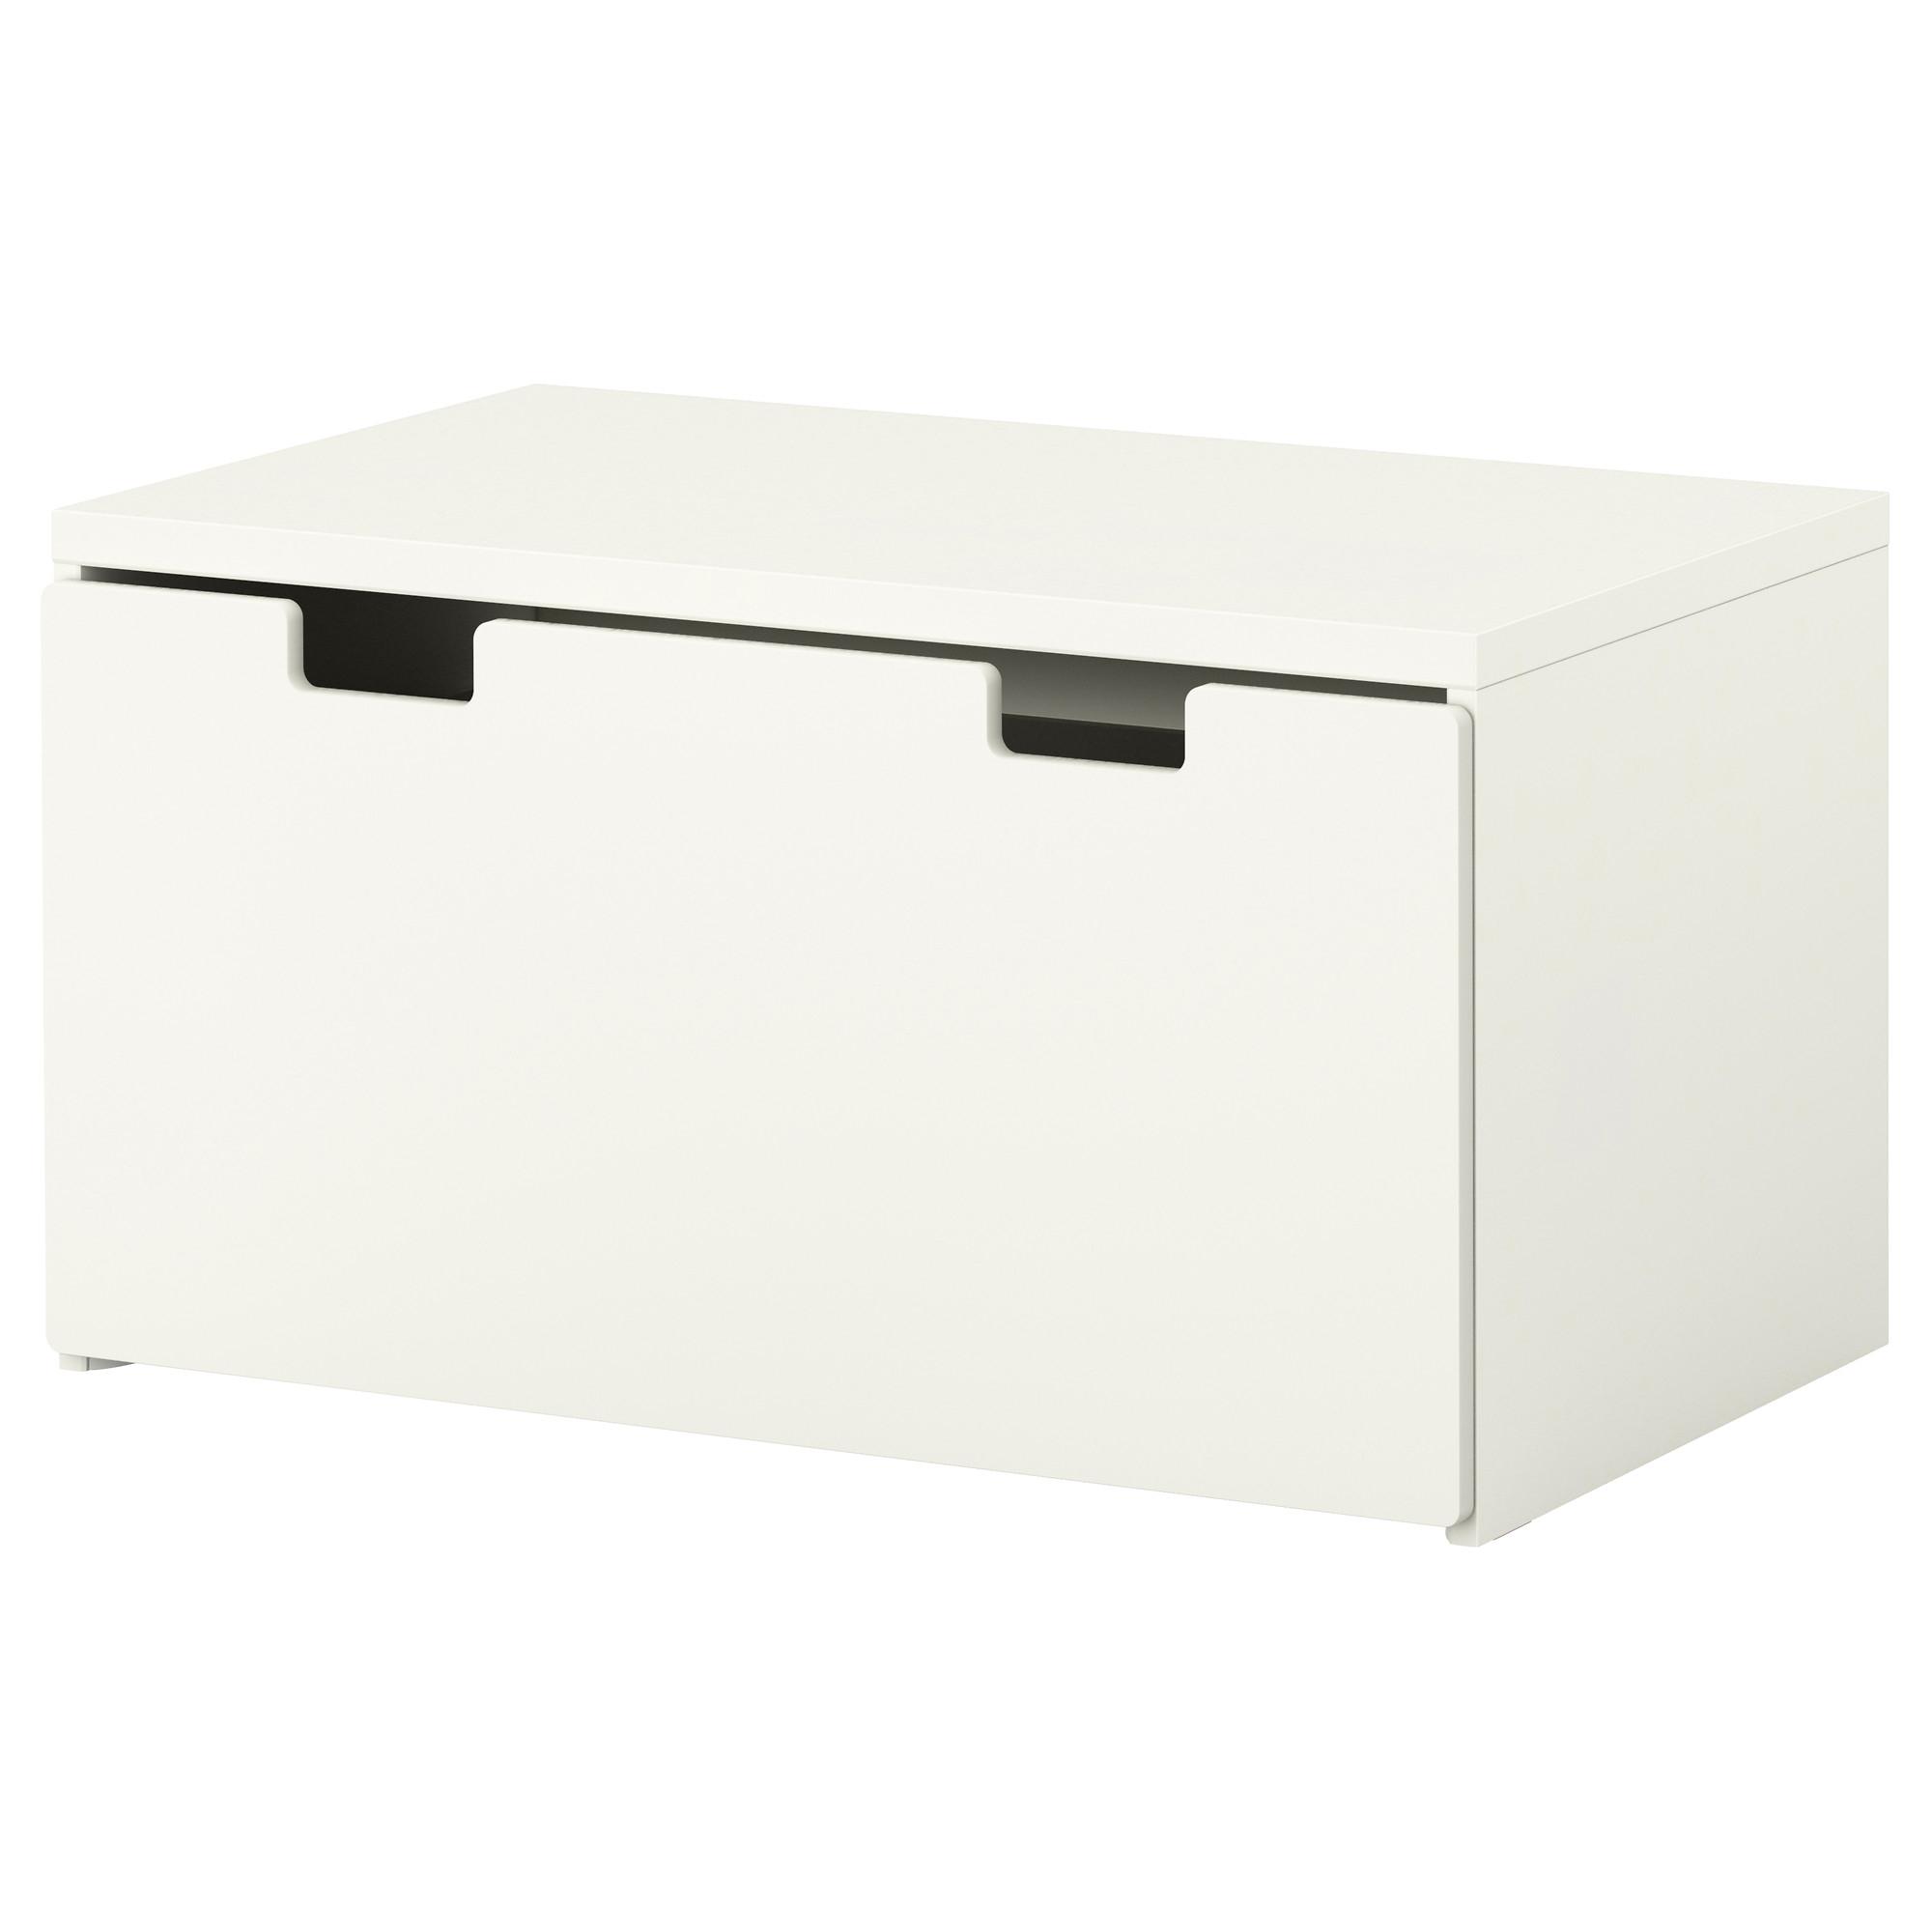 Ikea gran canaria detalles producto - Camas con almacenaje ikea ...